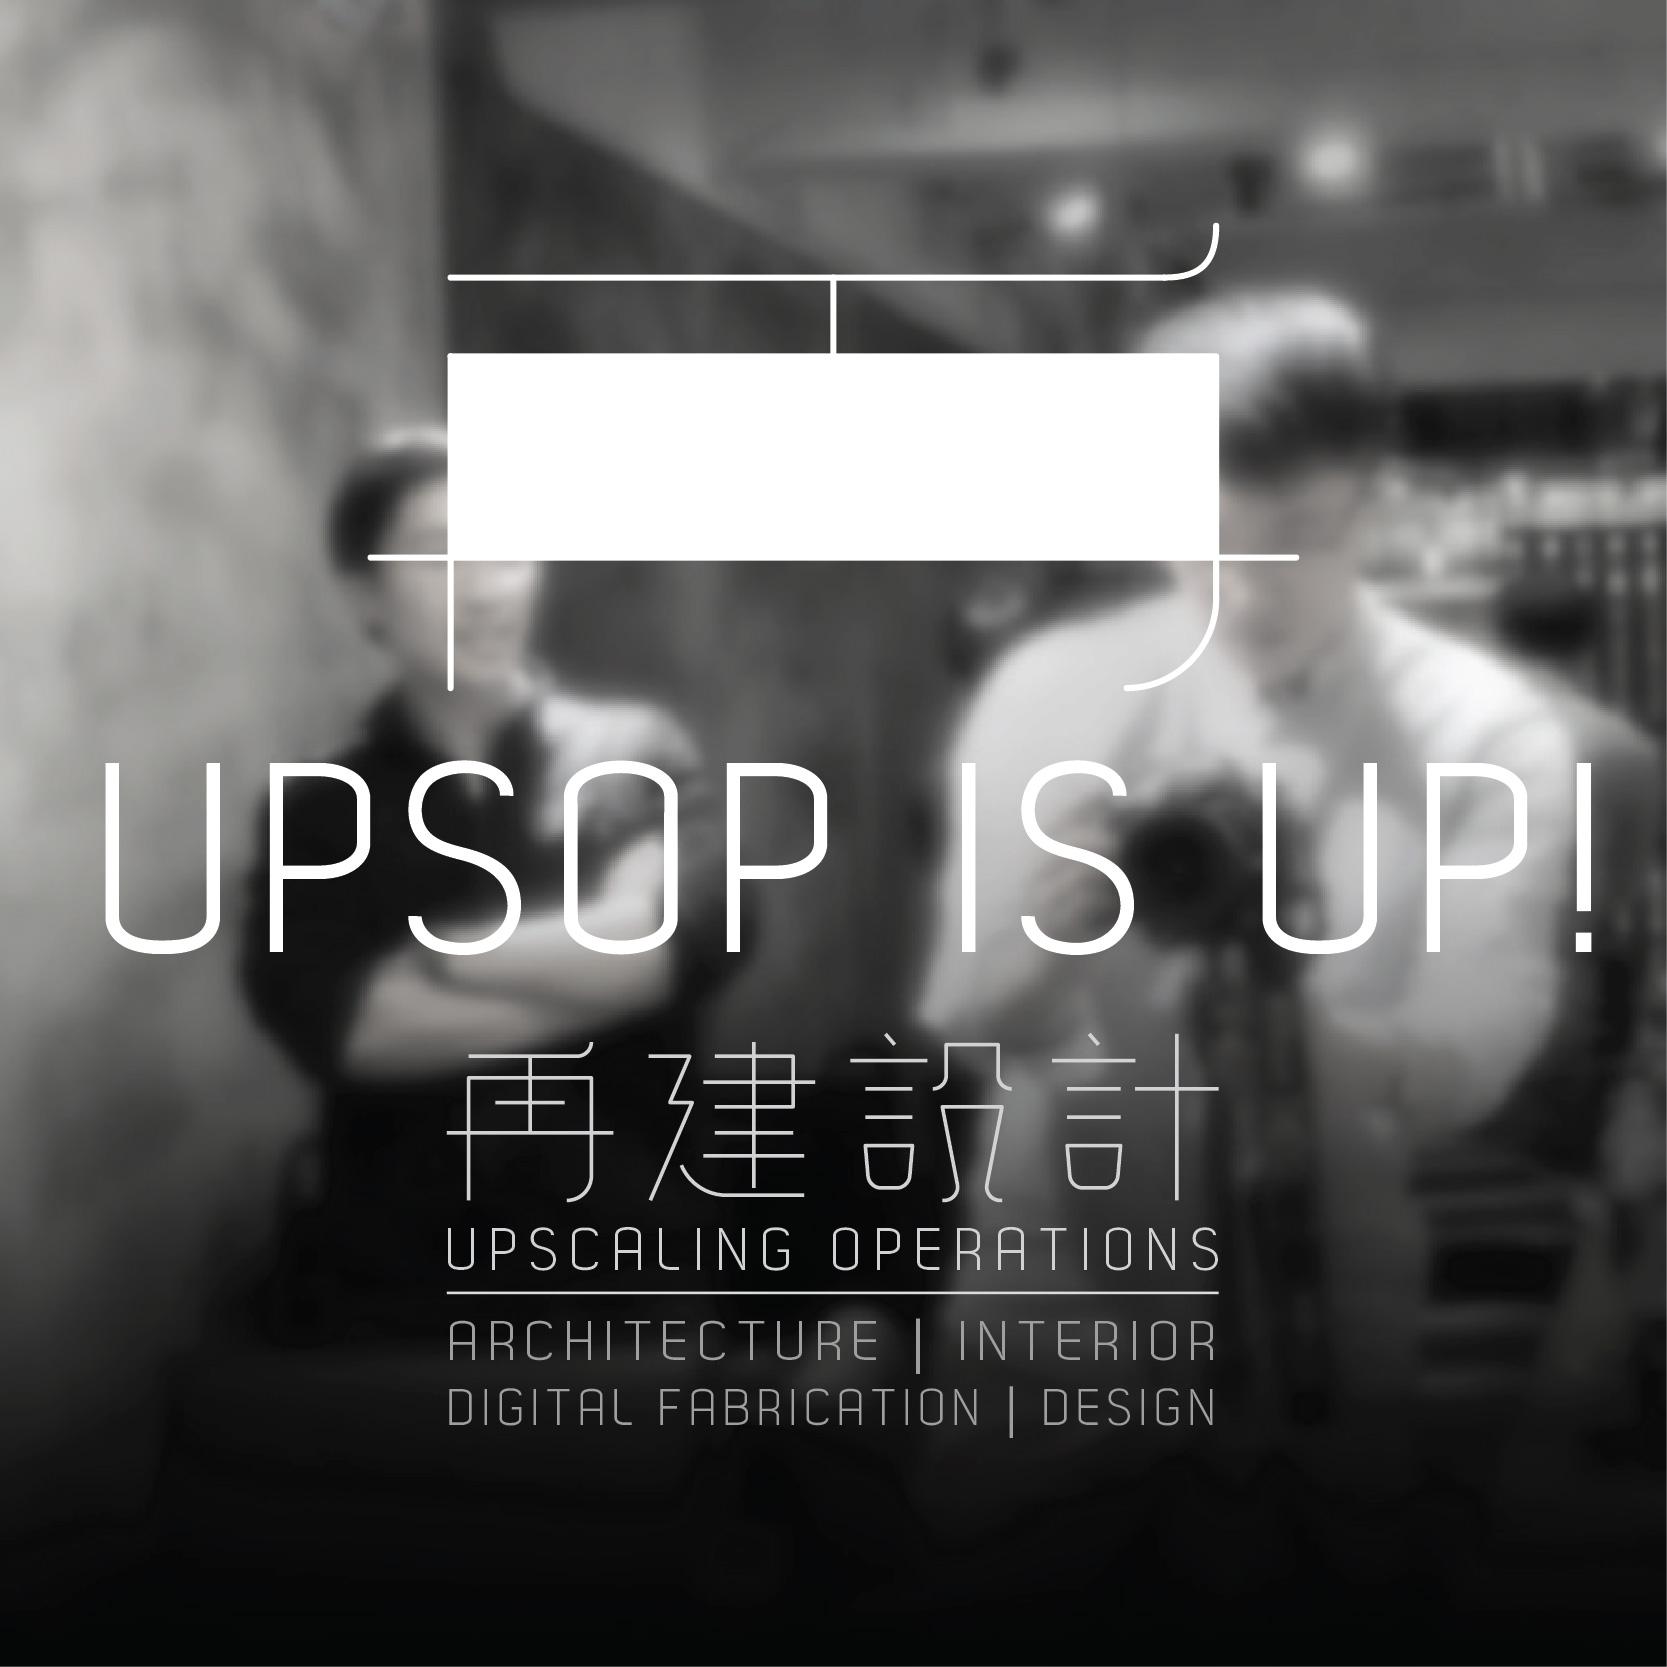 UPSOP Facebook Launch